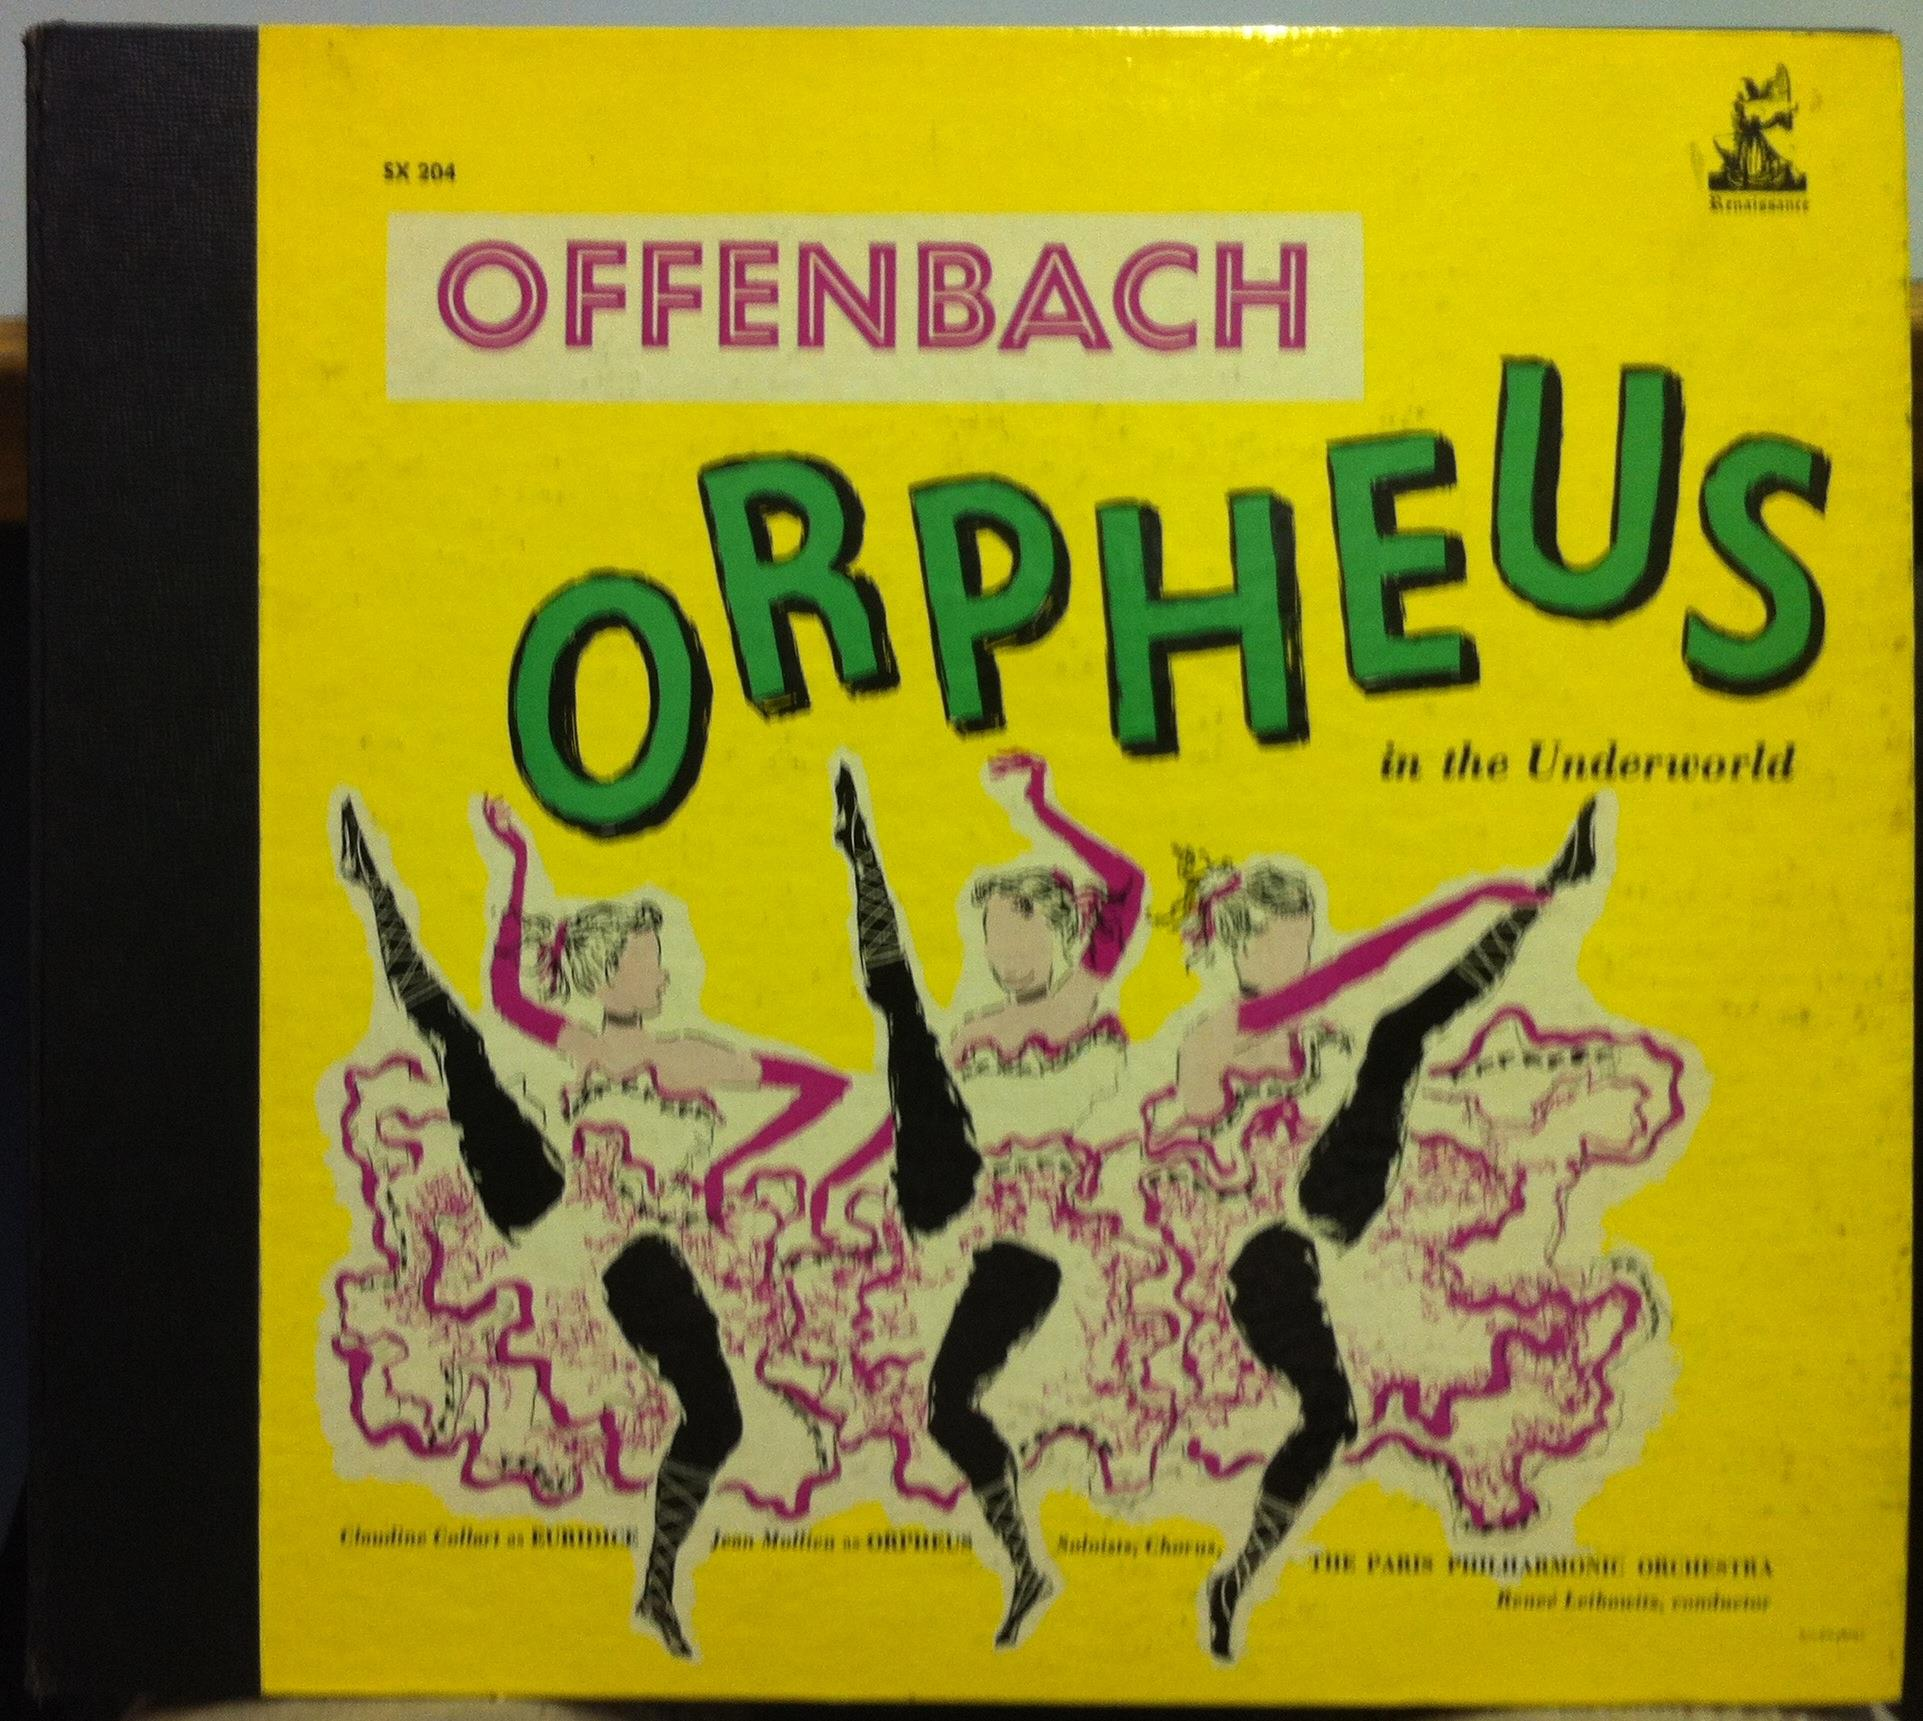 1952 ed1 mono w book renee leibowitz offenbach orpheus 2 for Hs offenbach